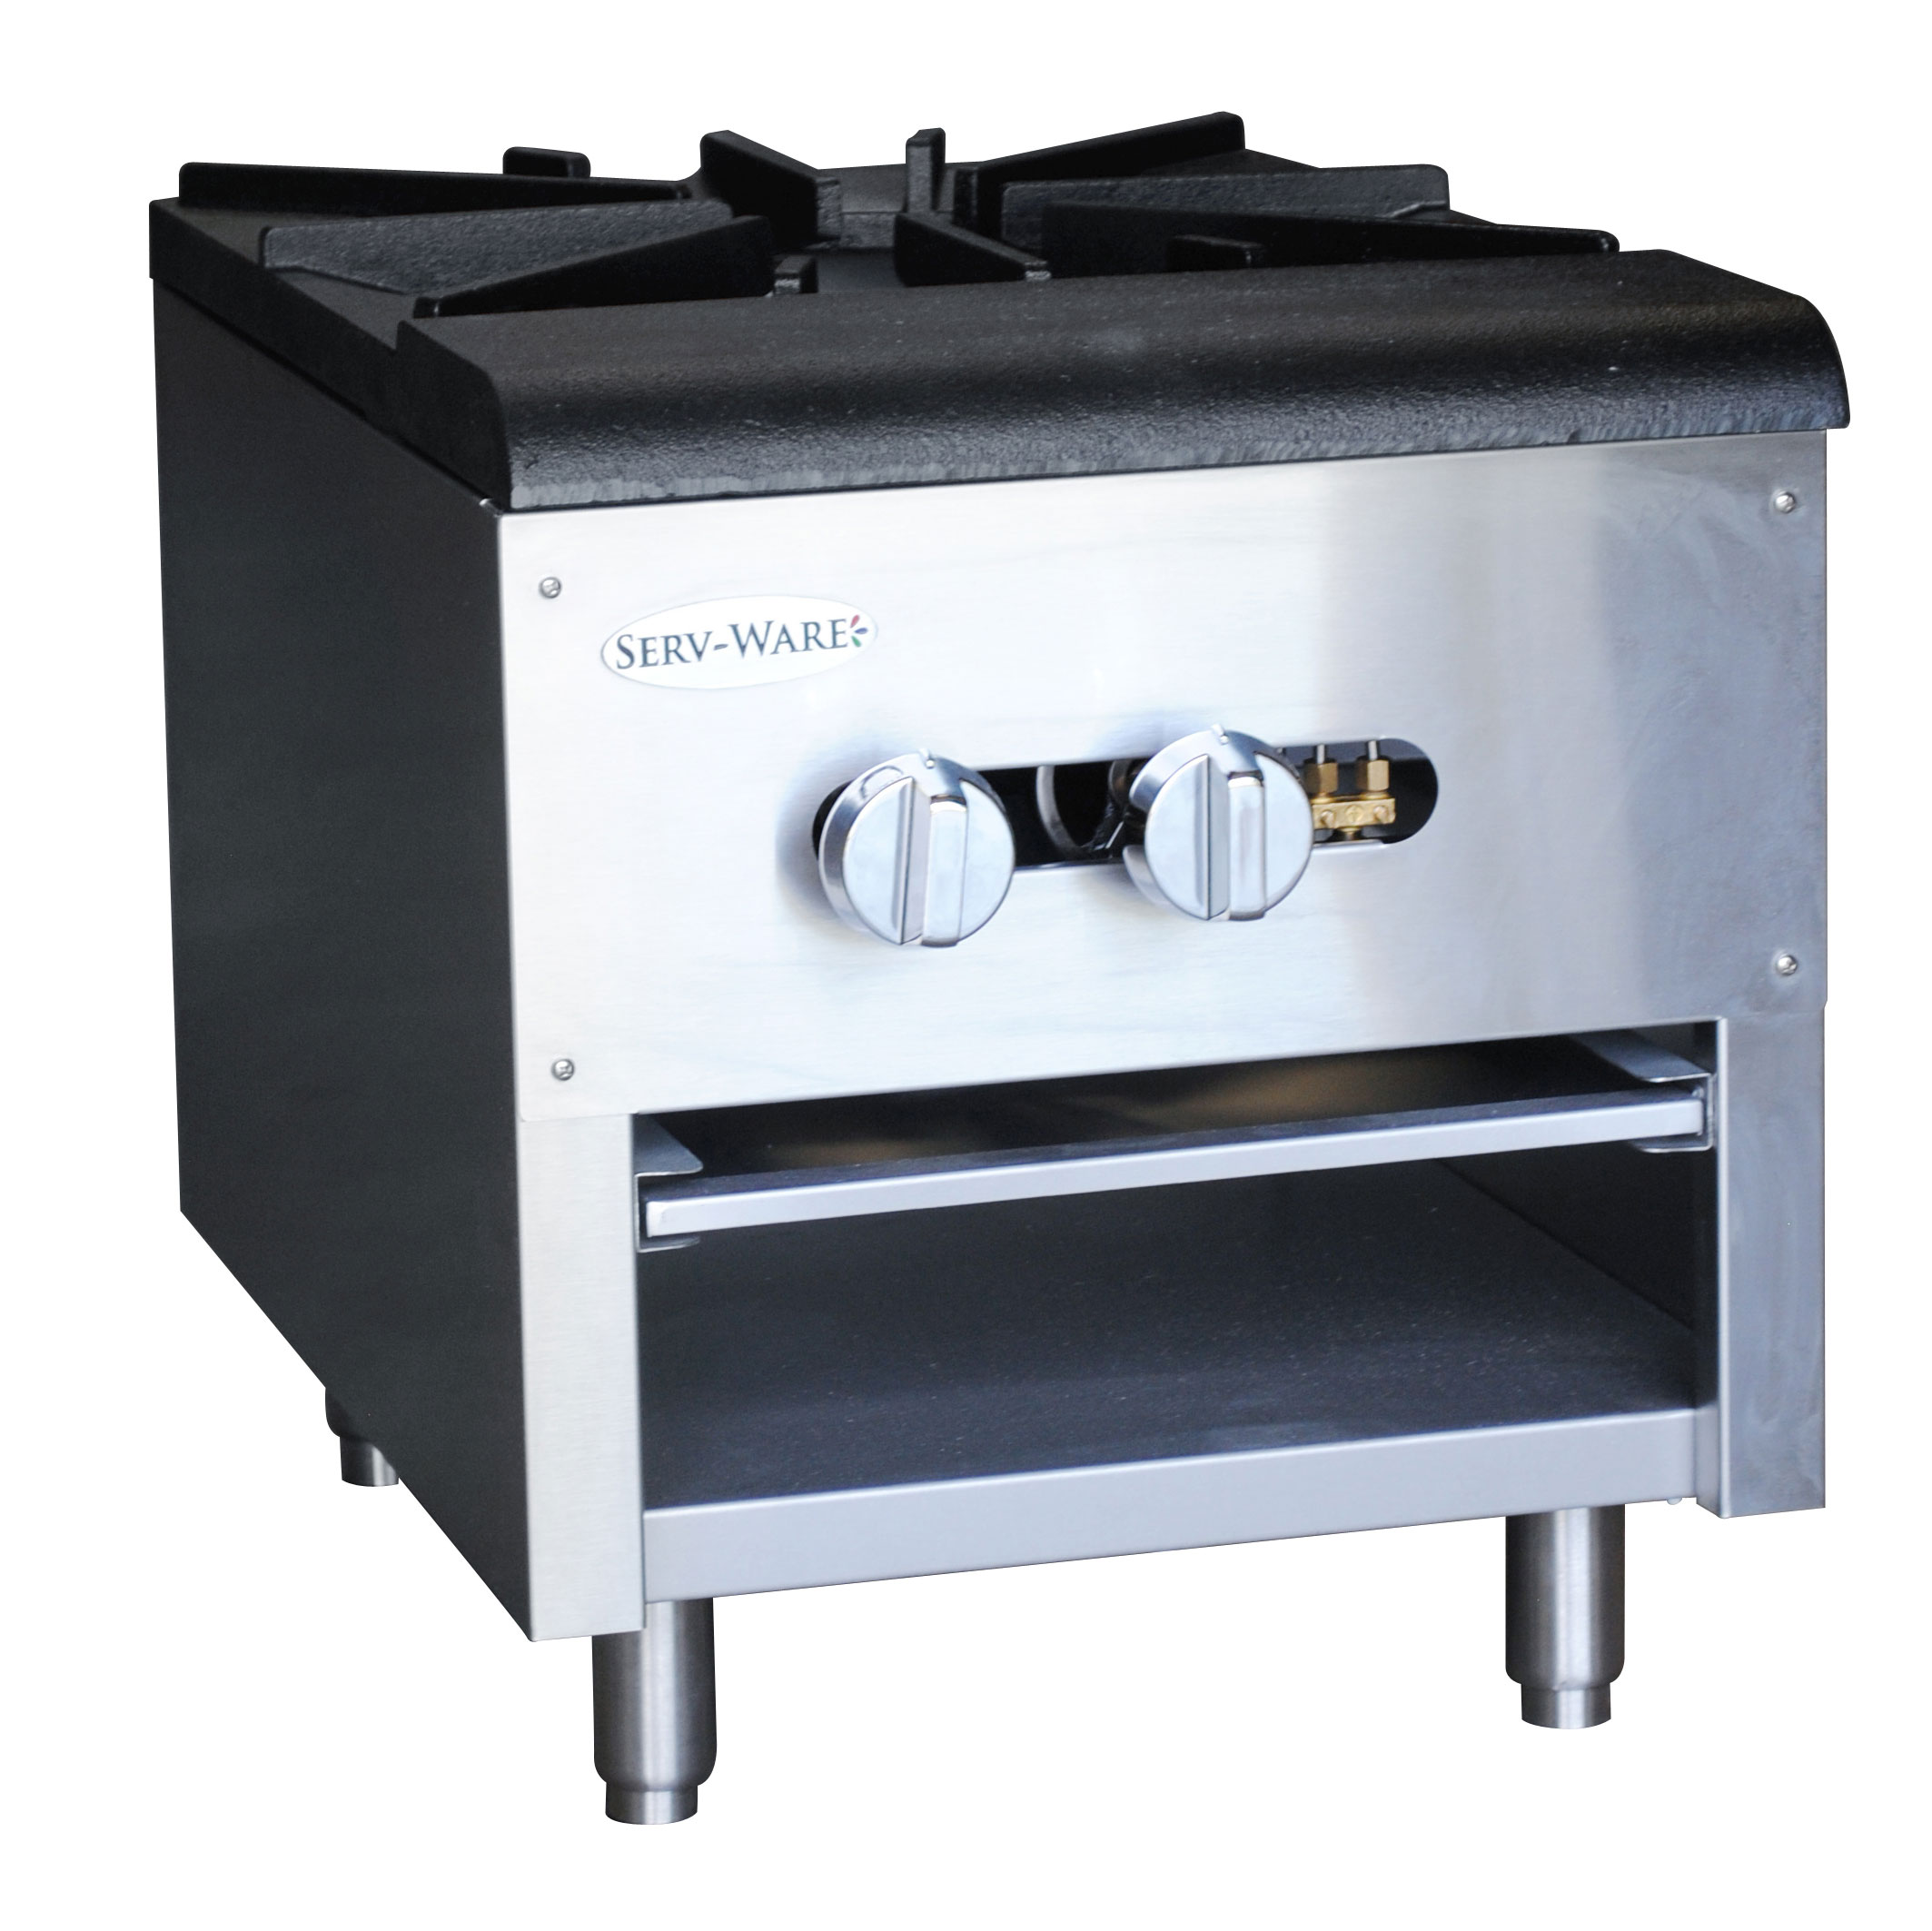 Serv-Ware SSSP-1 range, stock pot, gas